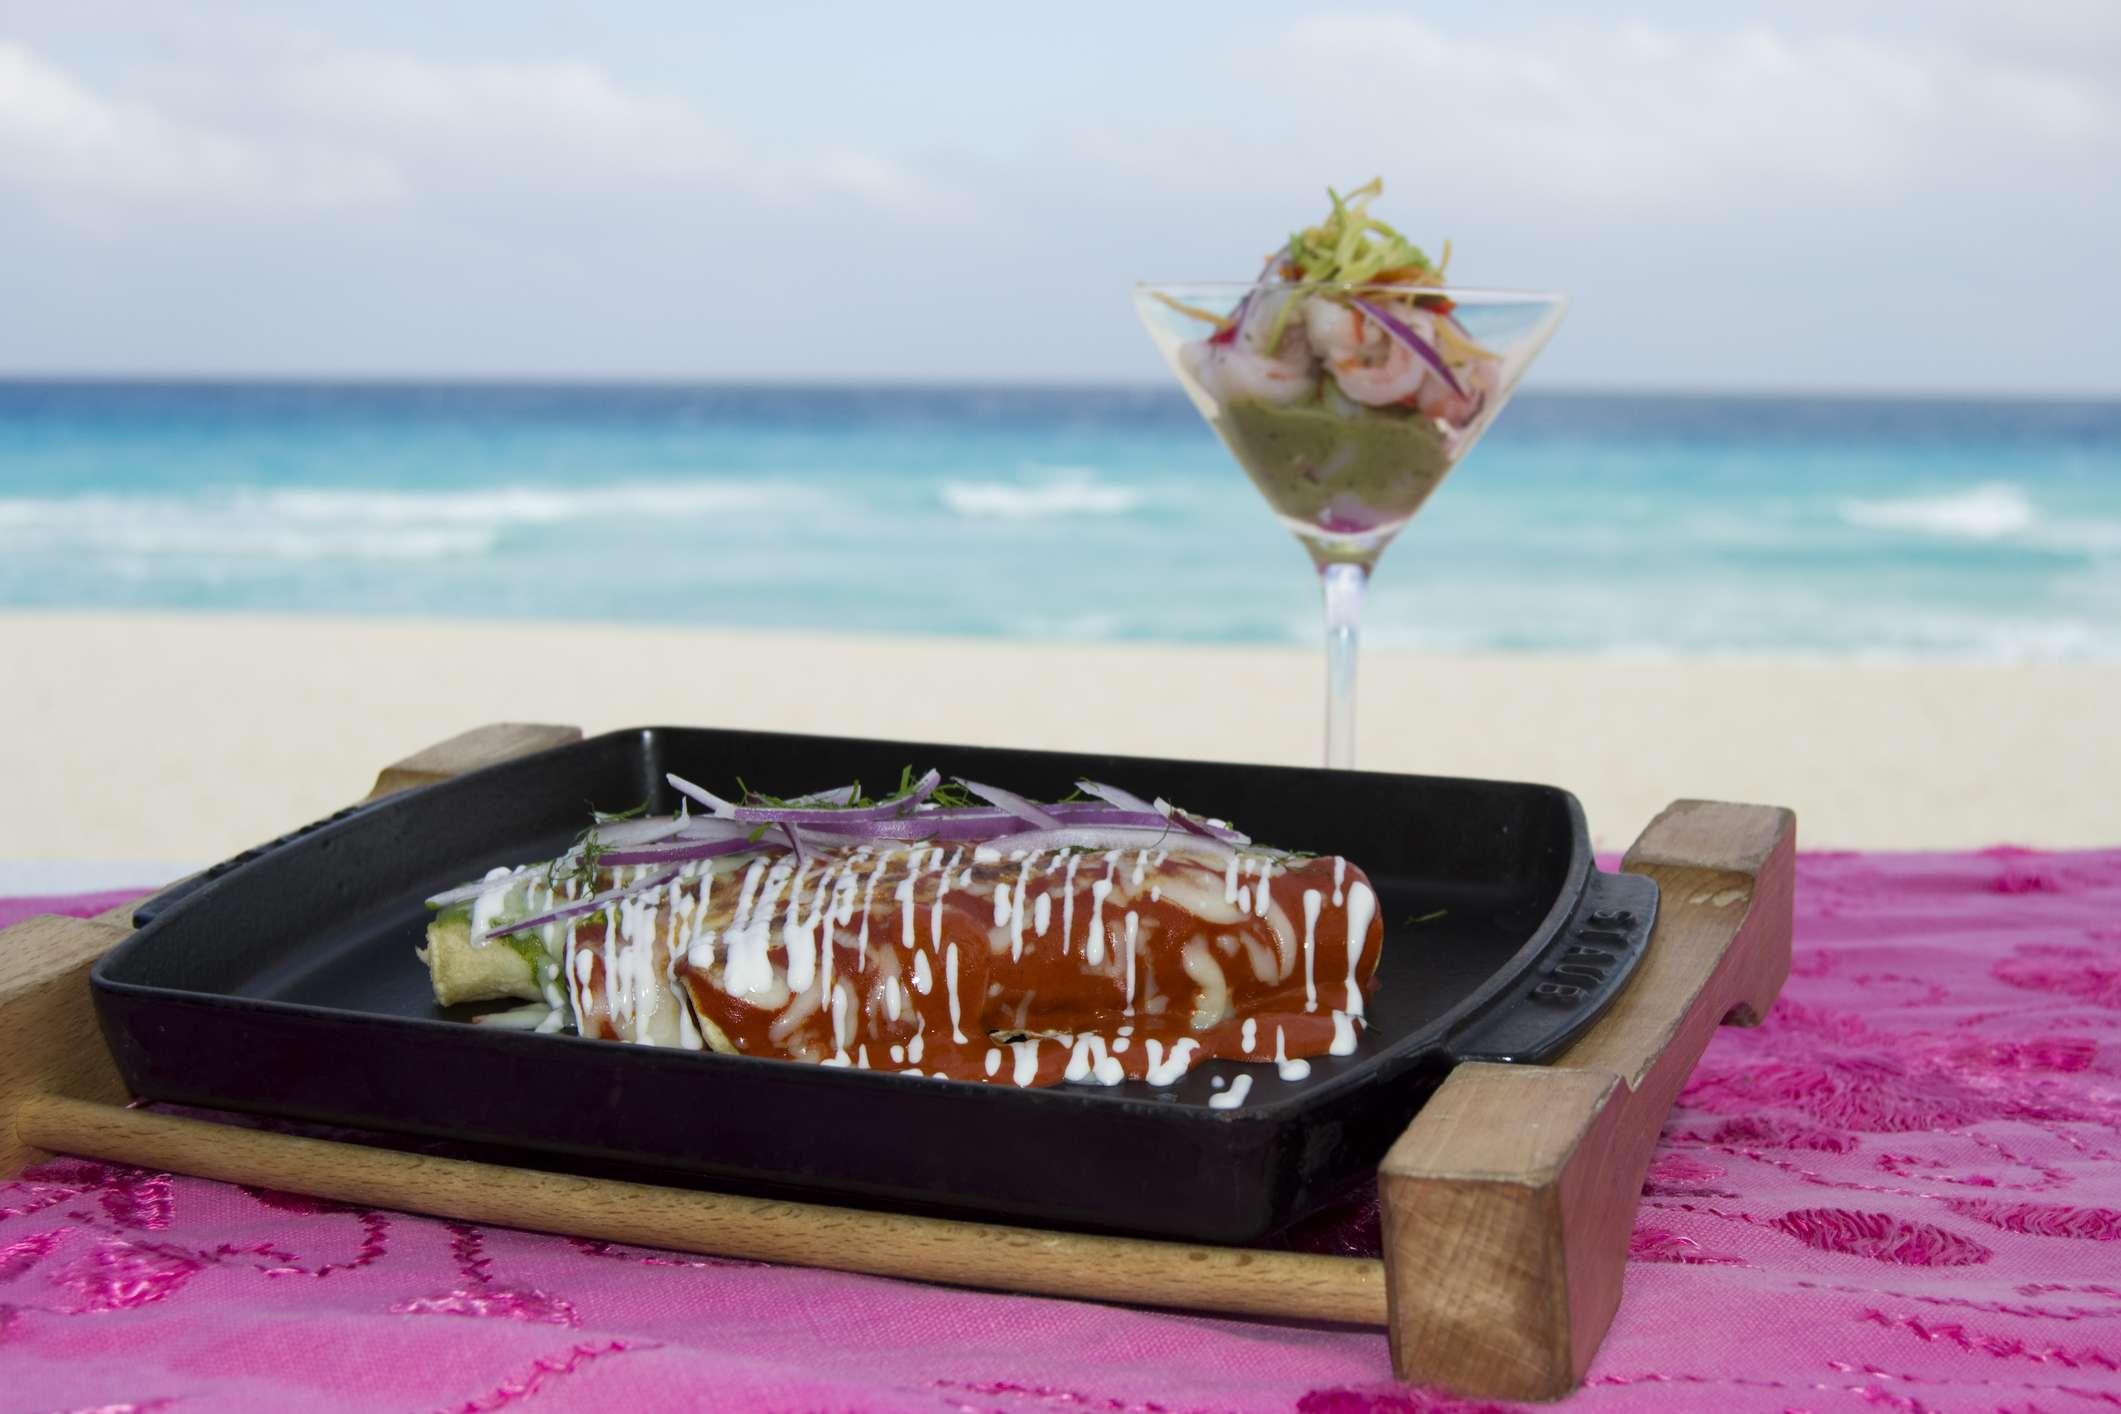 Beachside chicken enchilada and prawn cocktail at Ritz Carlton hotel.